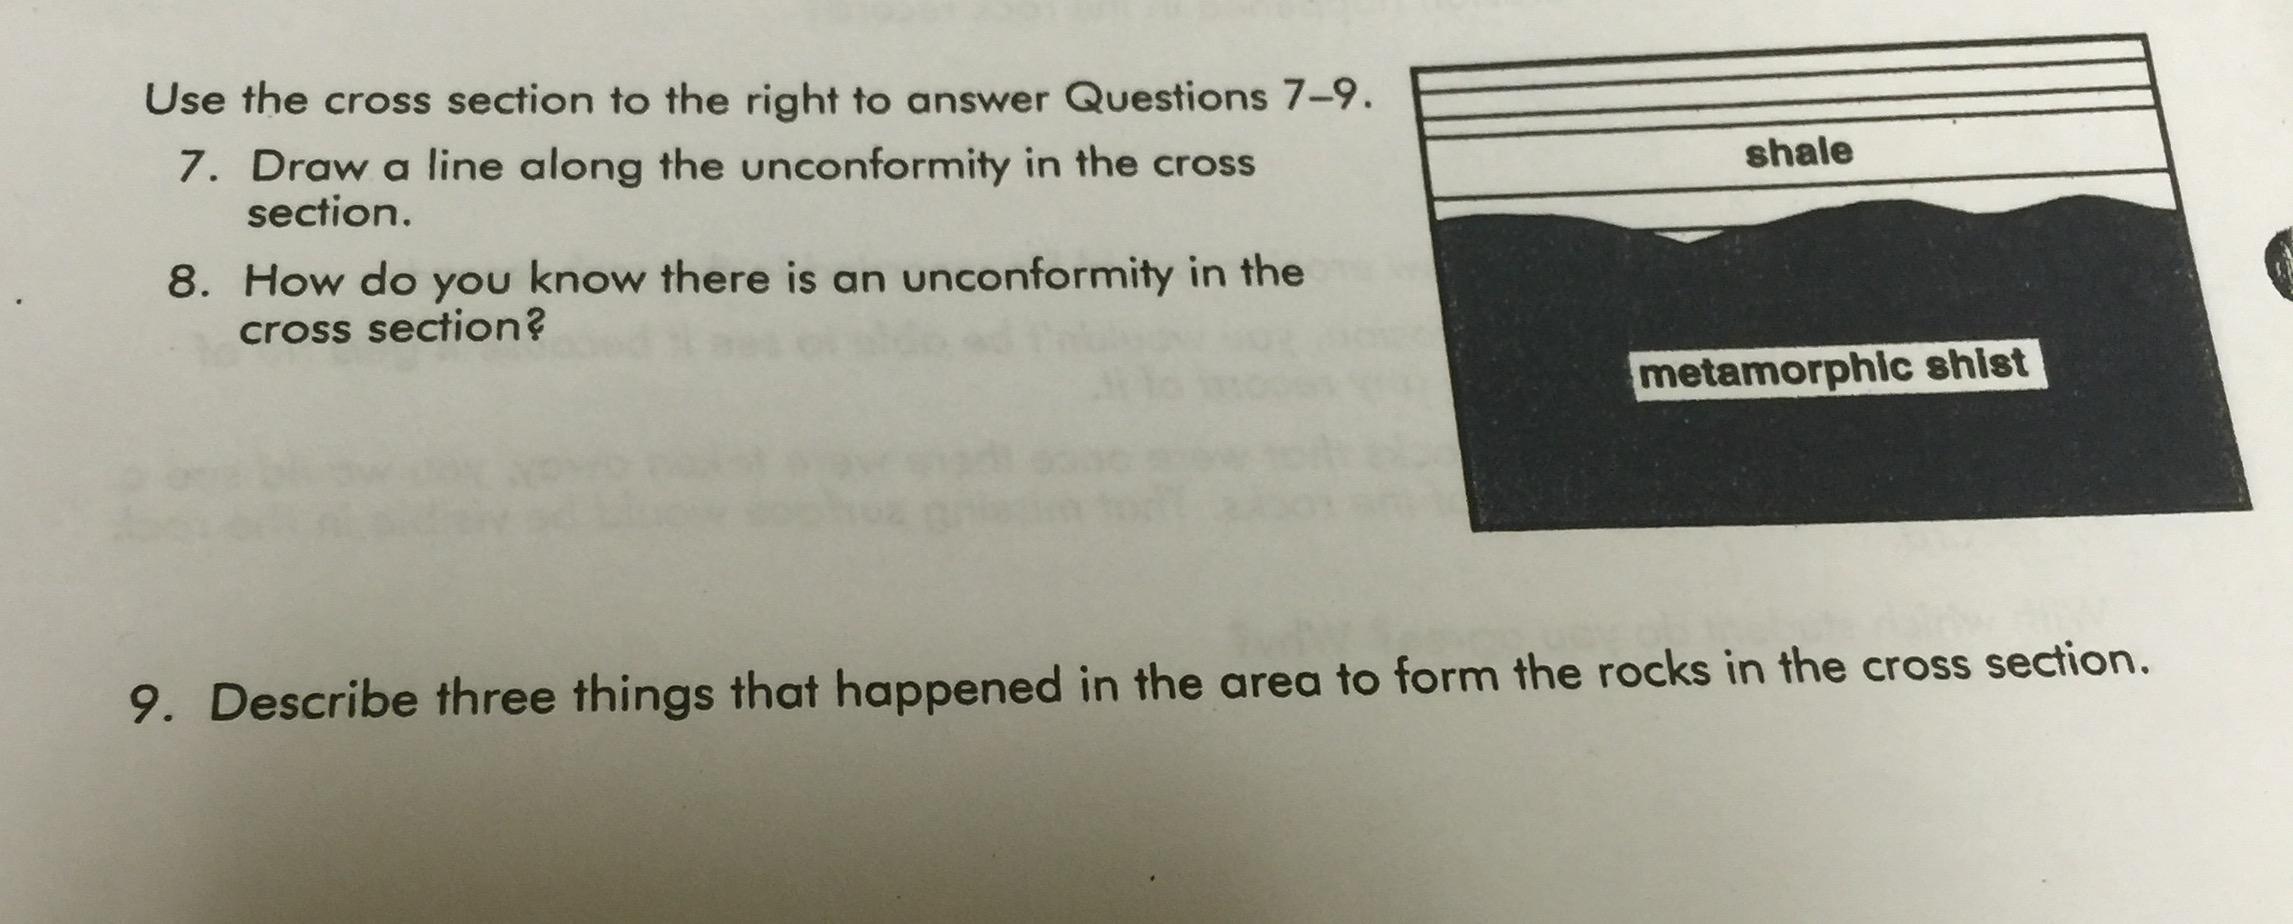 Draw A Line Along The Unconformity In The Cross Se... | Chegg.com